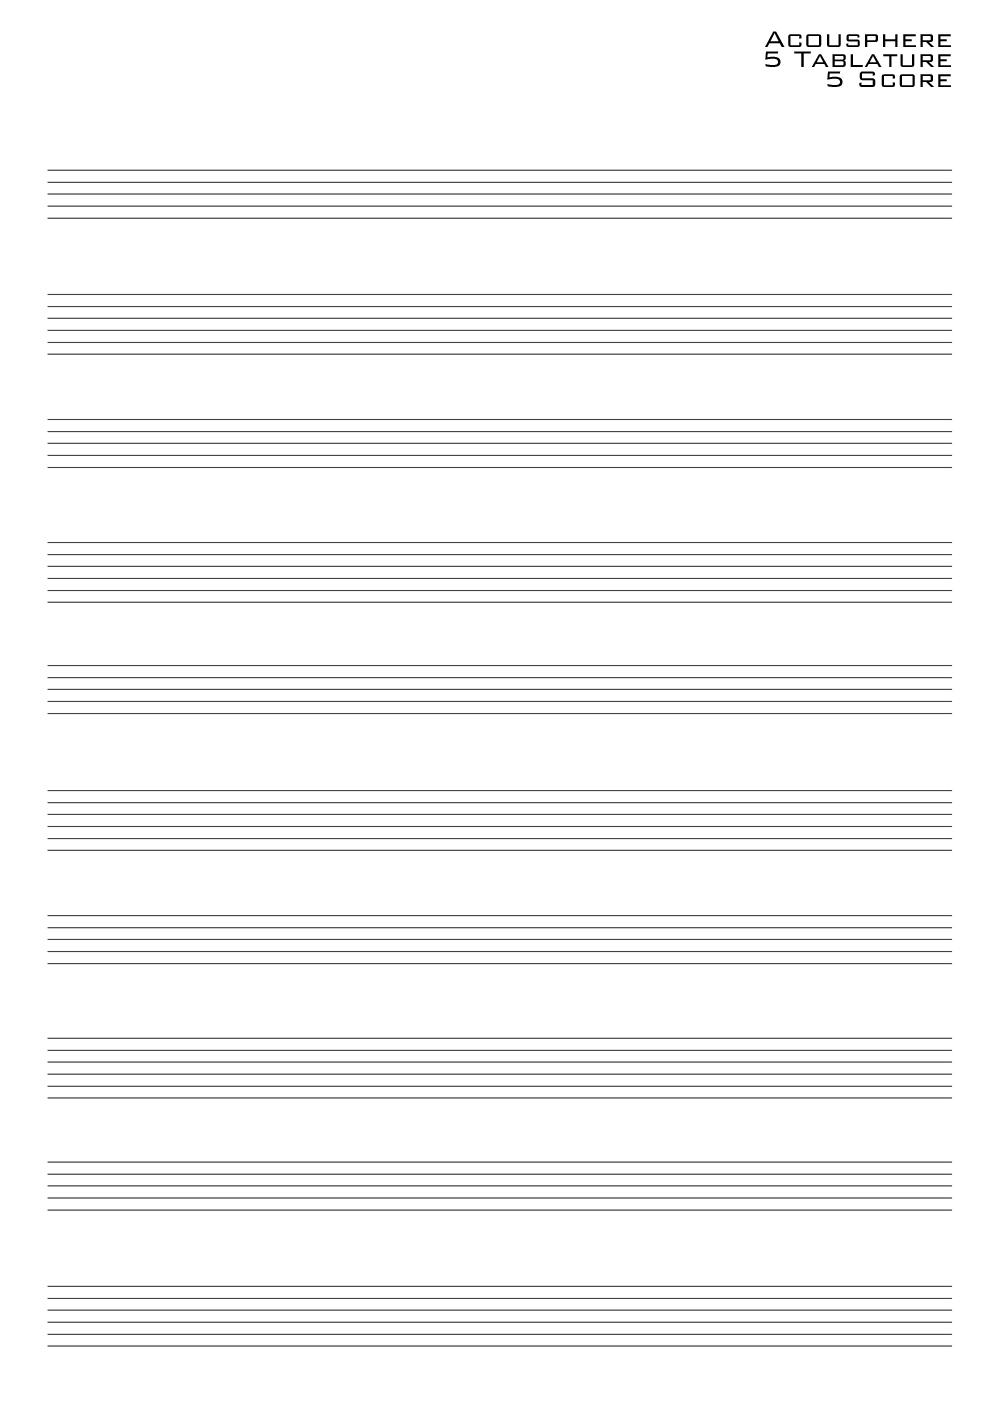 Guitar Lesson - Acousphere: 五線譜と ... : ノート テンプレート : すべての講義